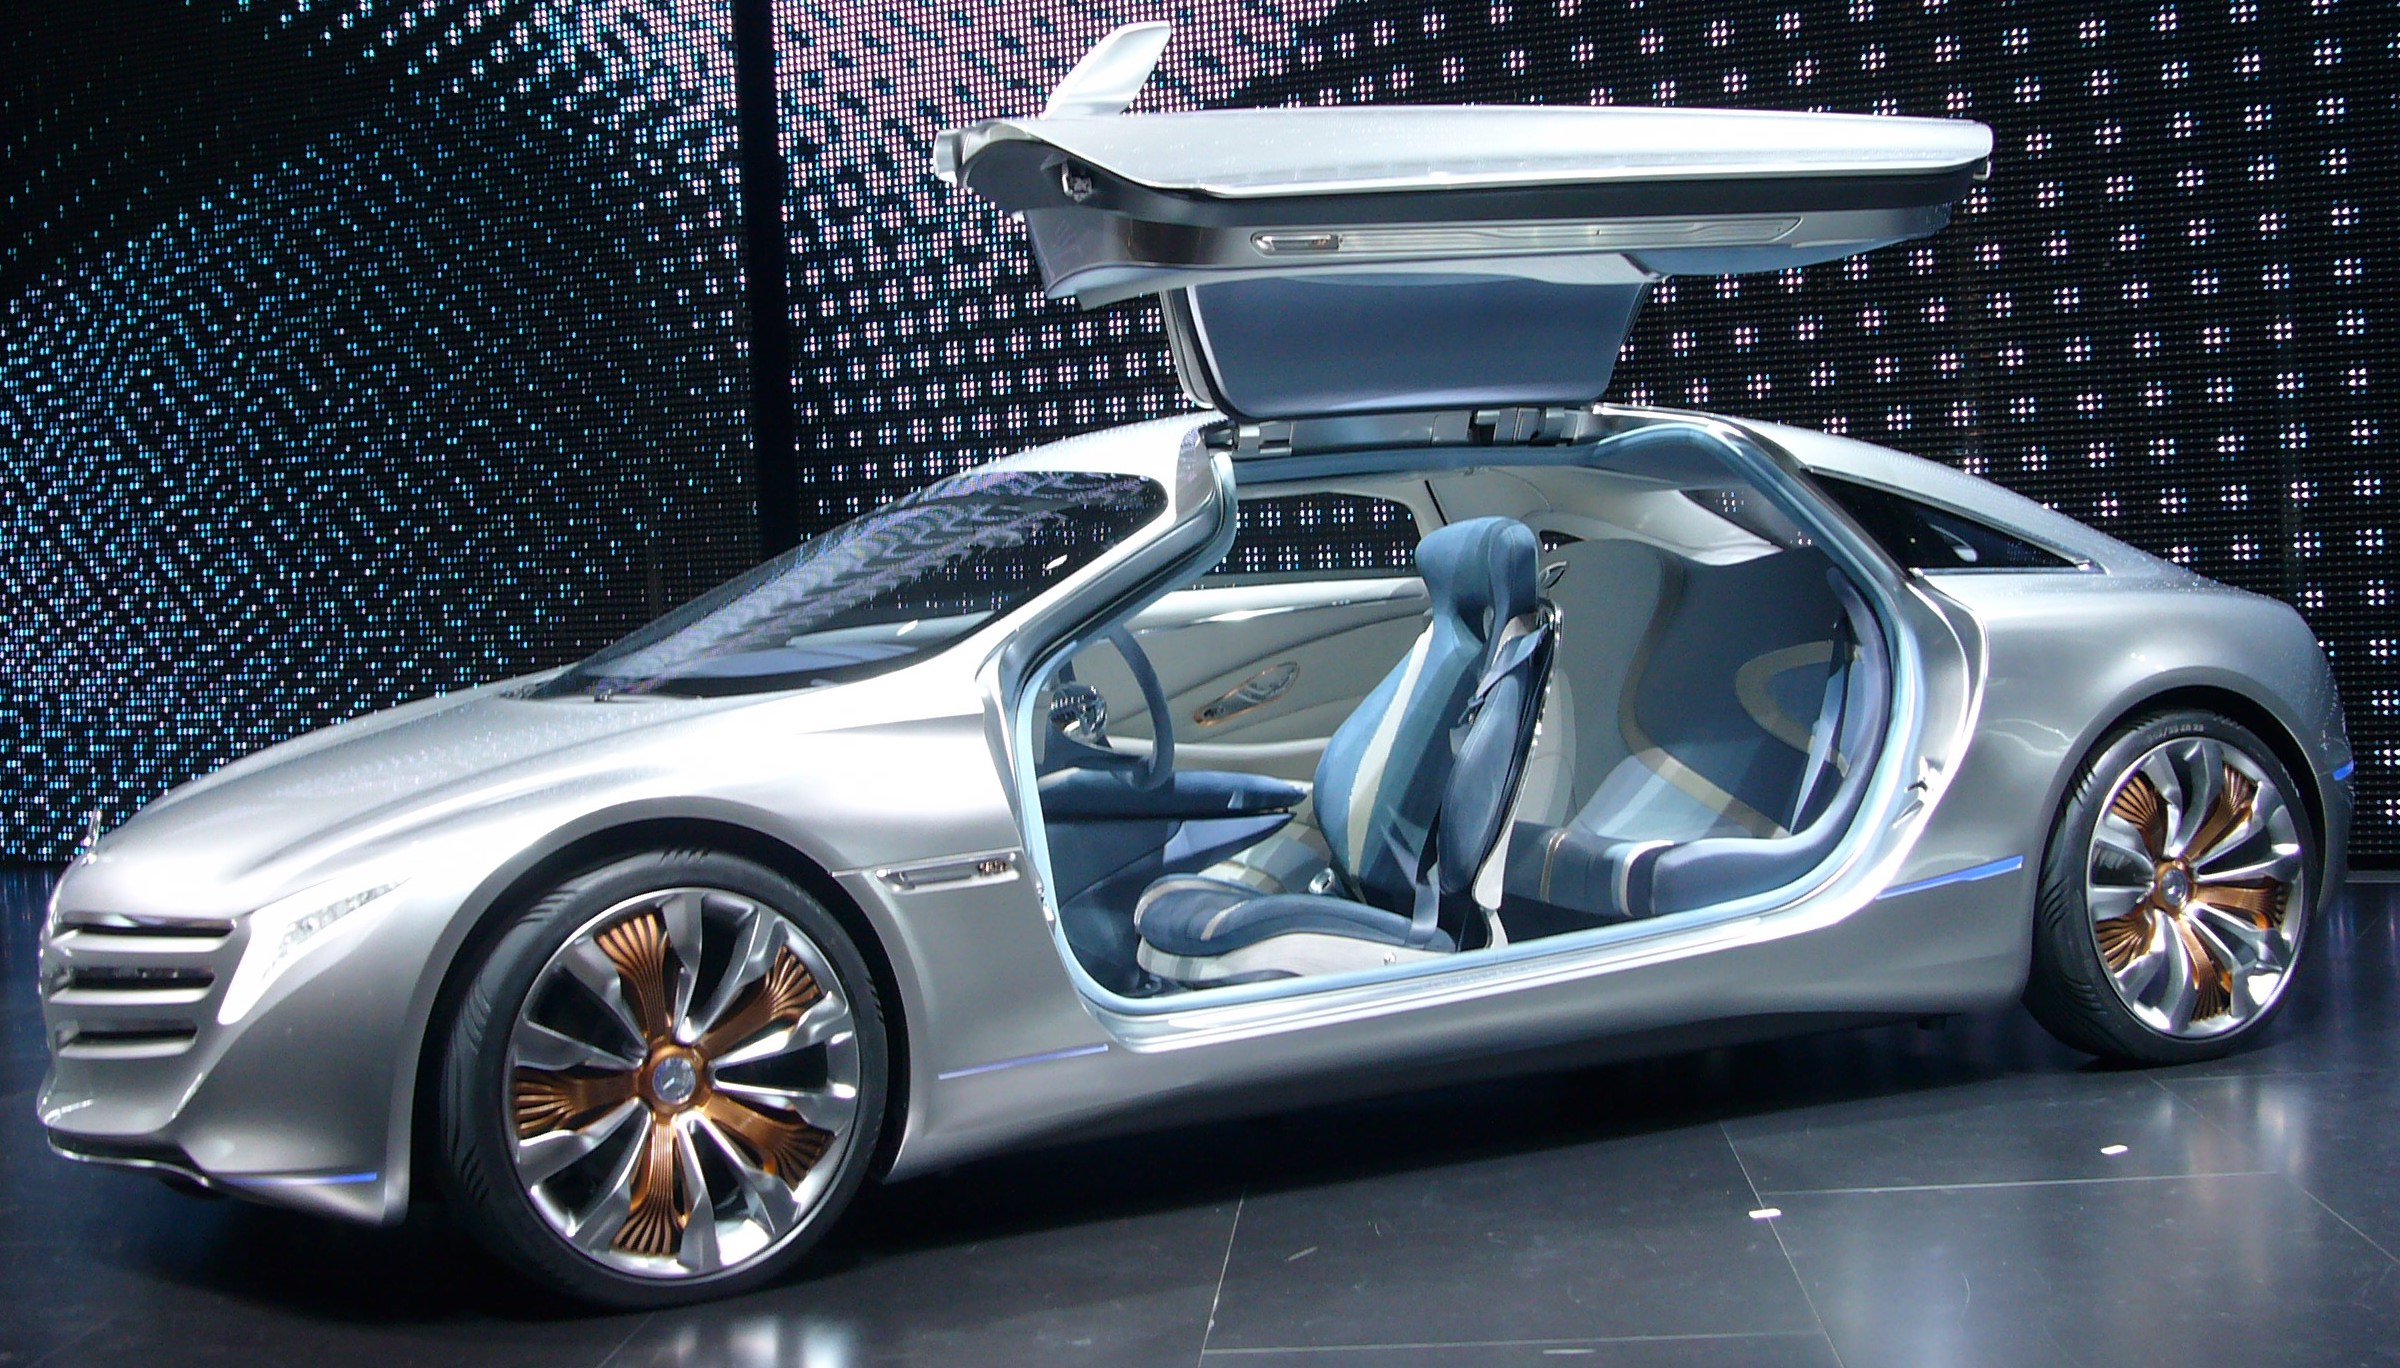 description mercedes benz f125 front quarter jpg. Cars Review. Best American Auto & Cars Review